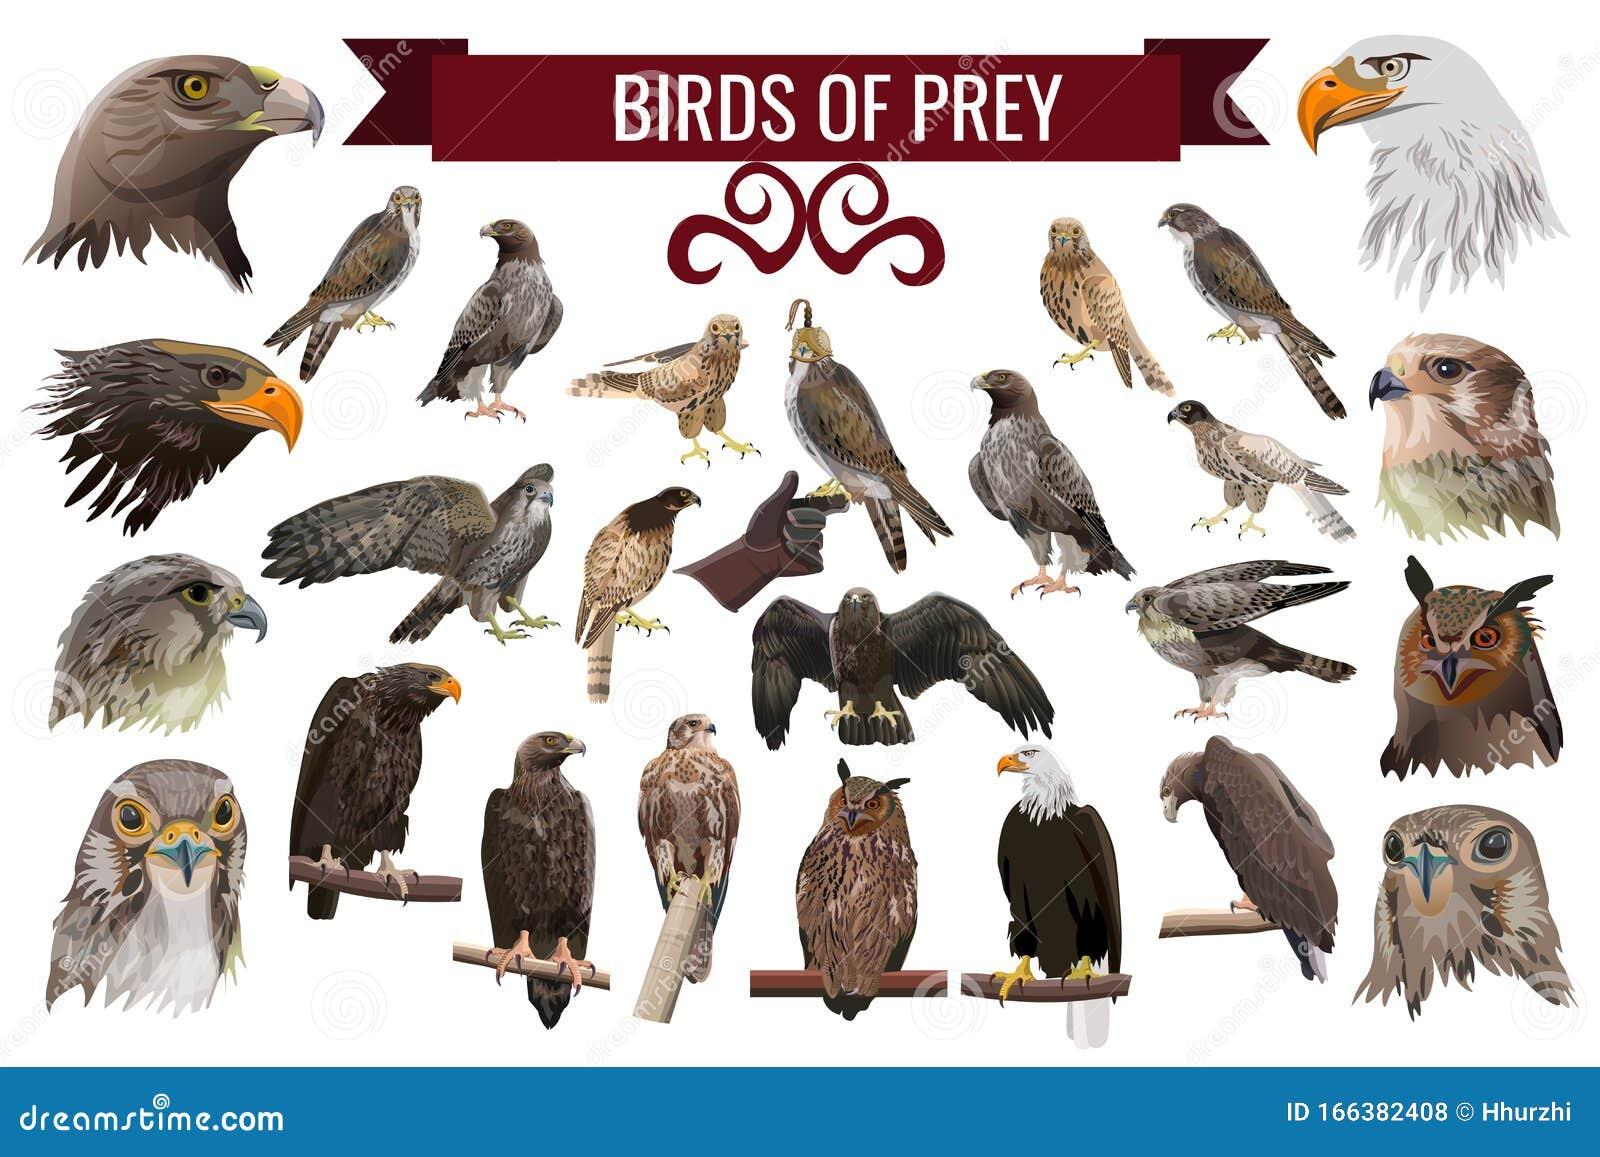 Set Of Birds Of Prey Vector Illustrations Stock Vector Illustration Of Mortarboard Icon 166382408